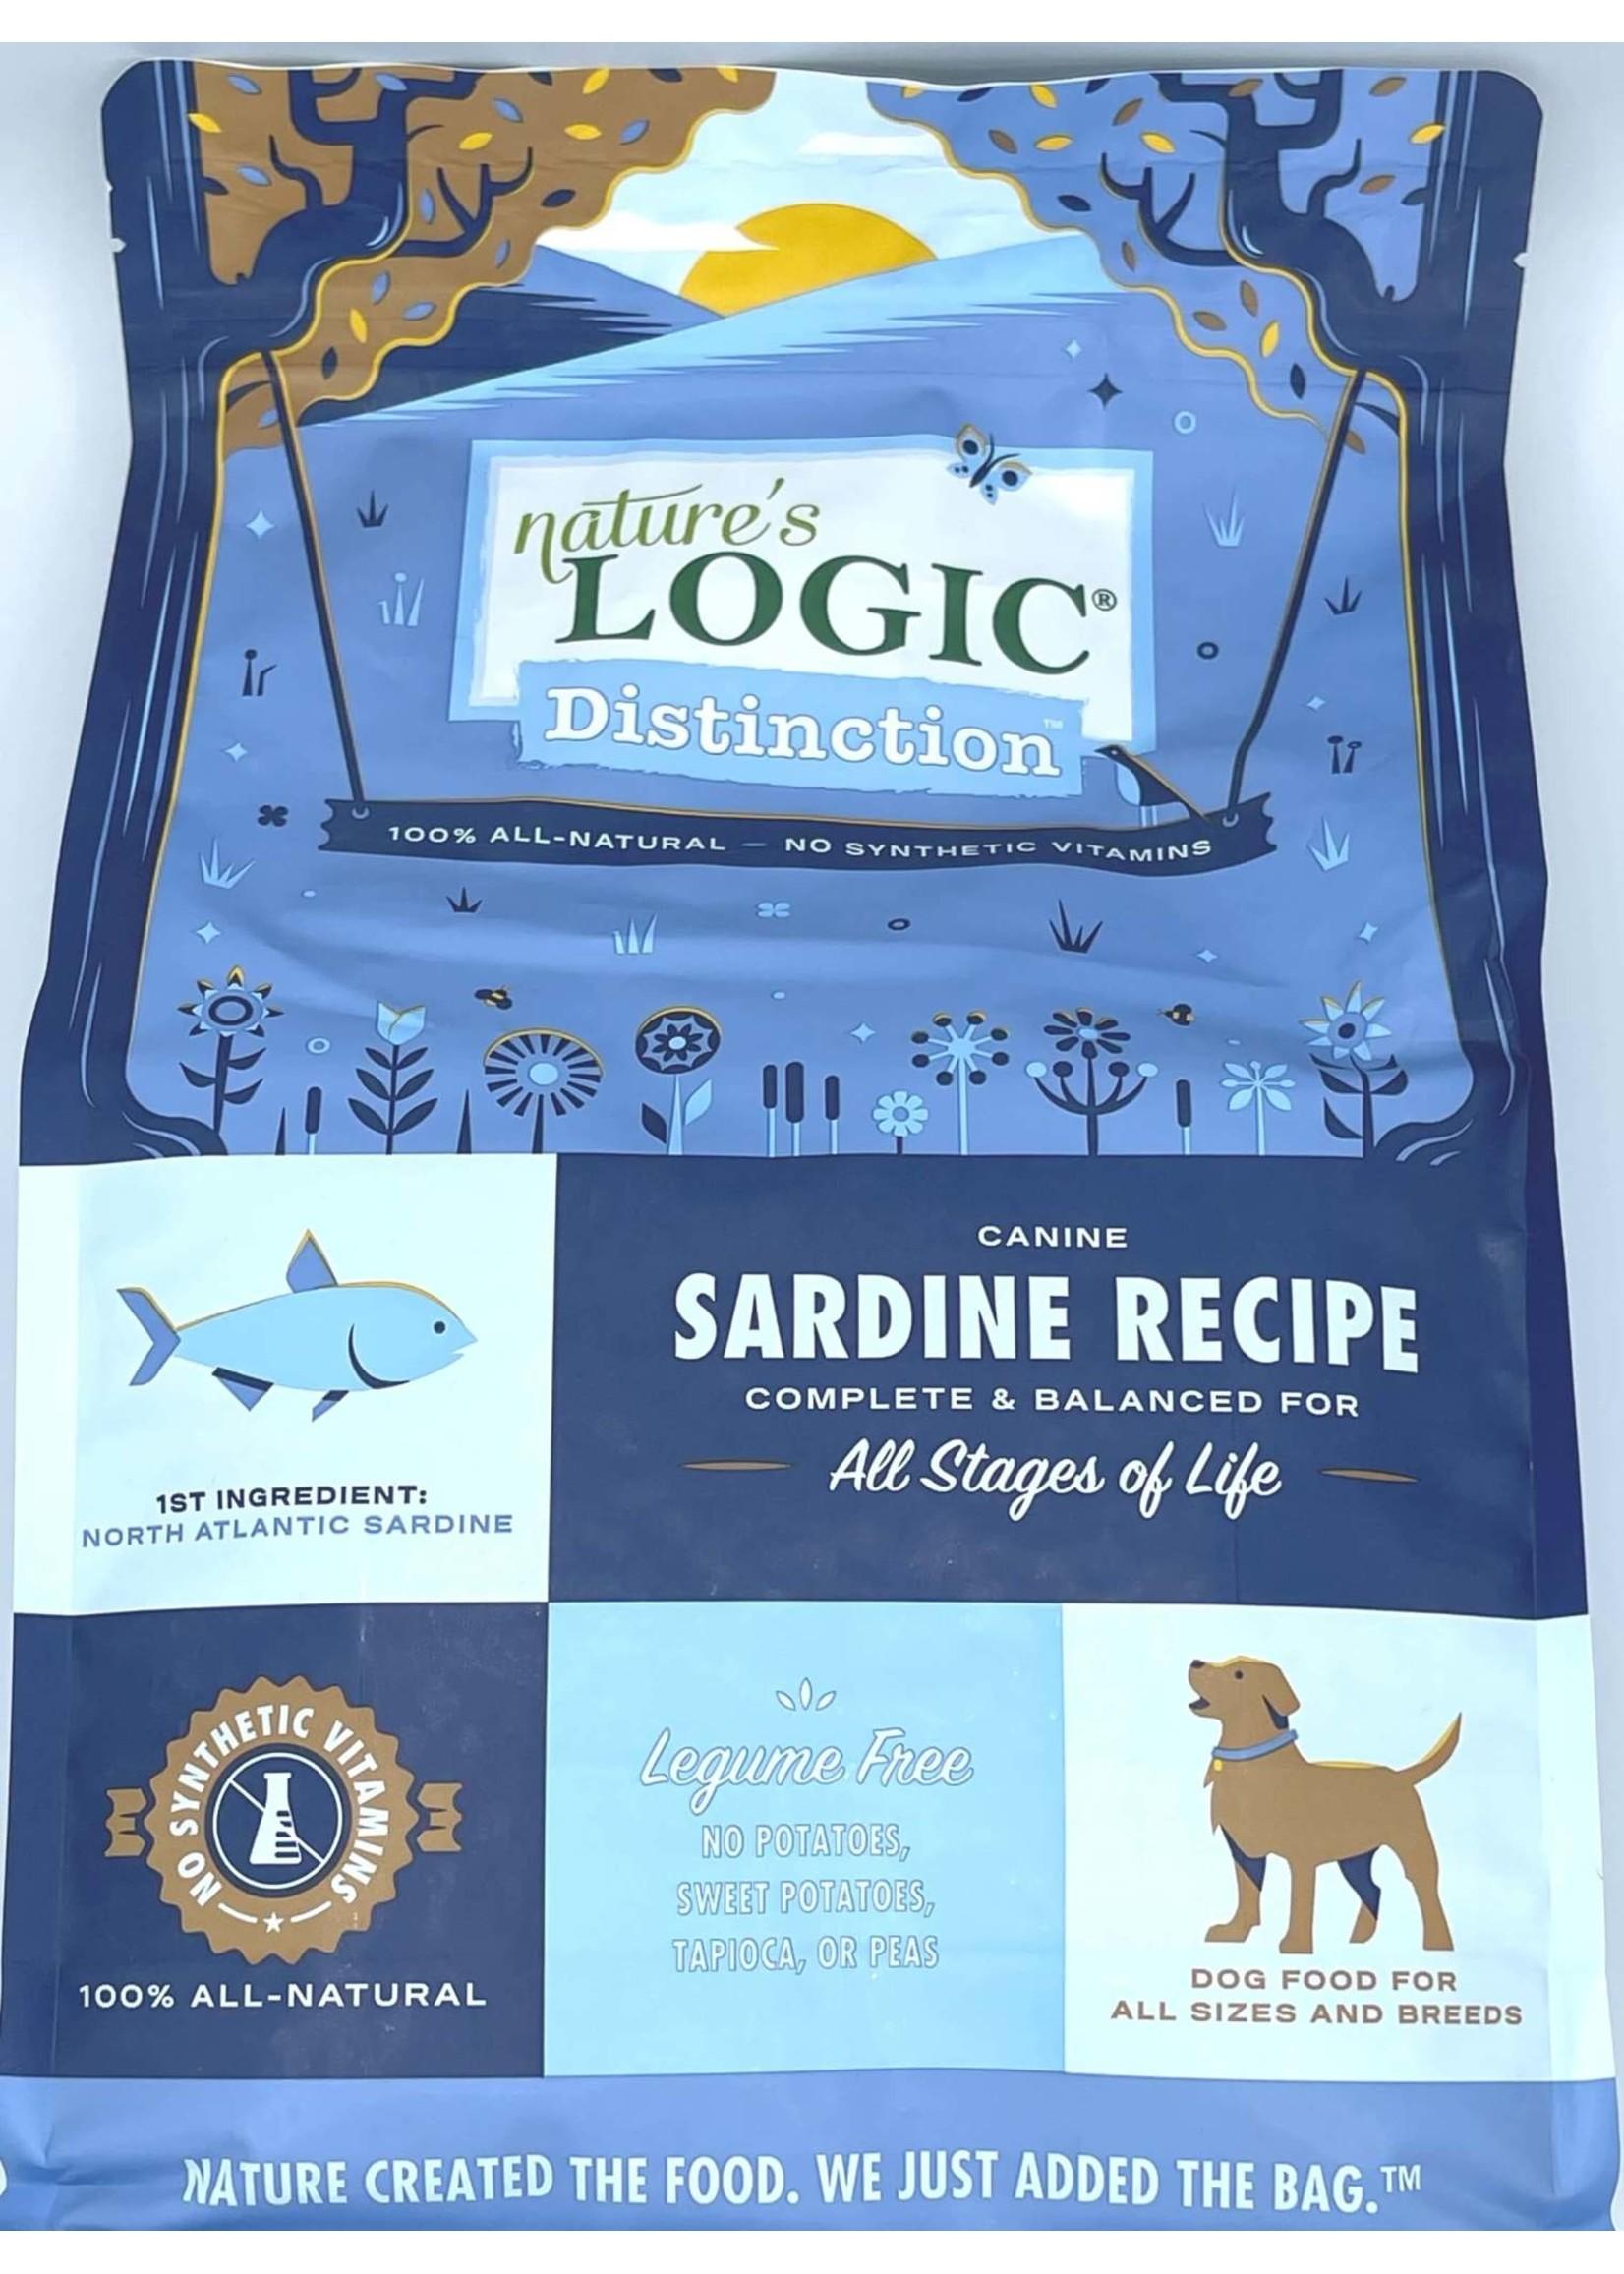 Nature's Logic Nature's Logic Distinction Dog Food Sardine